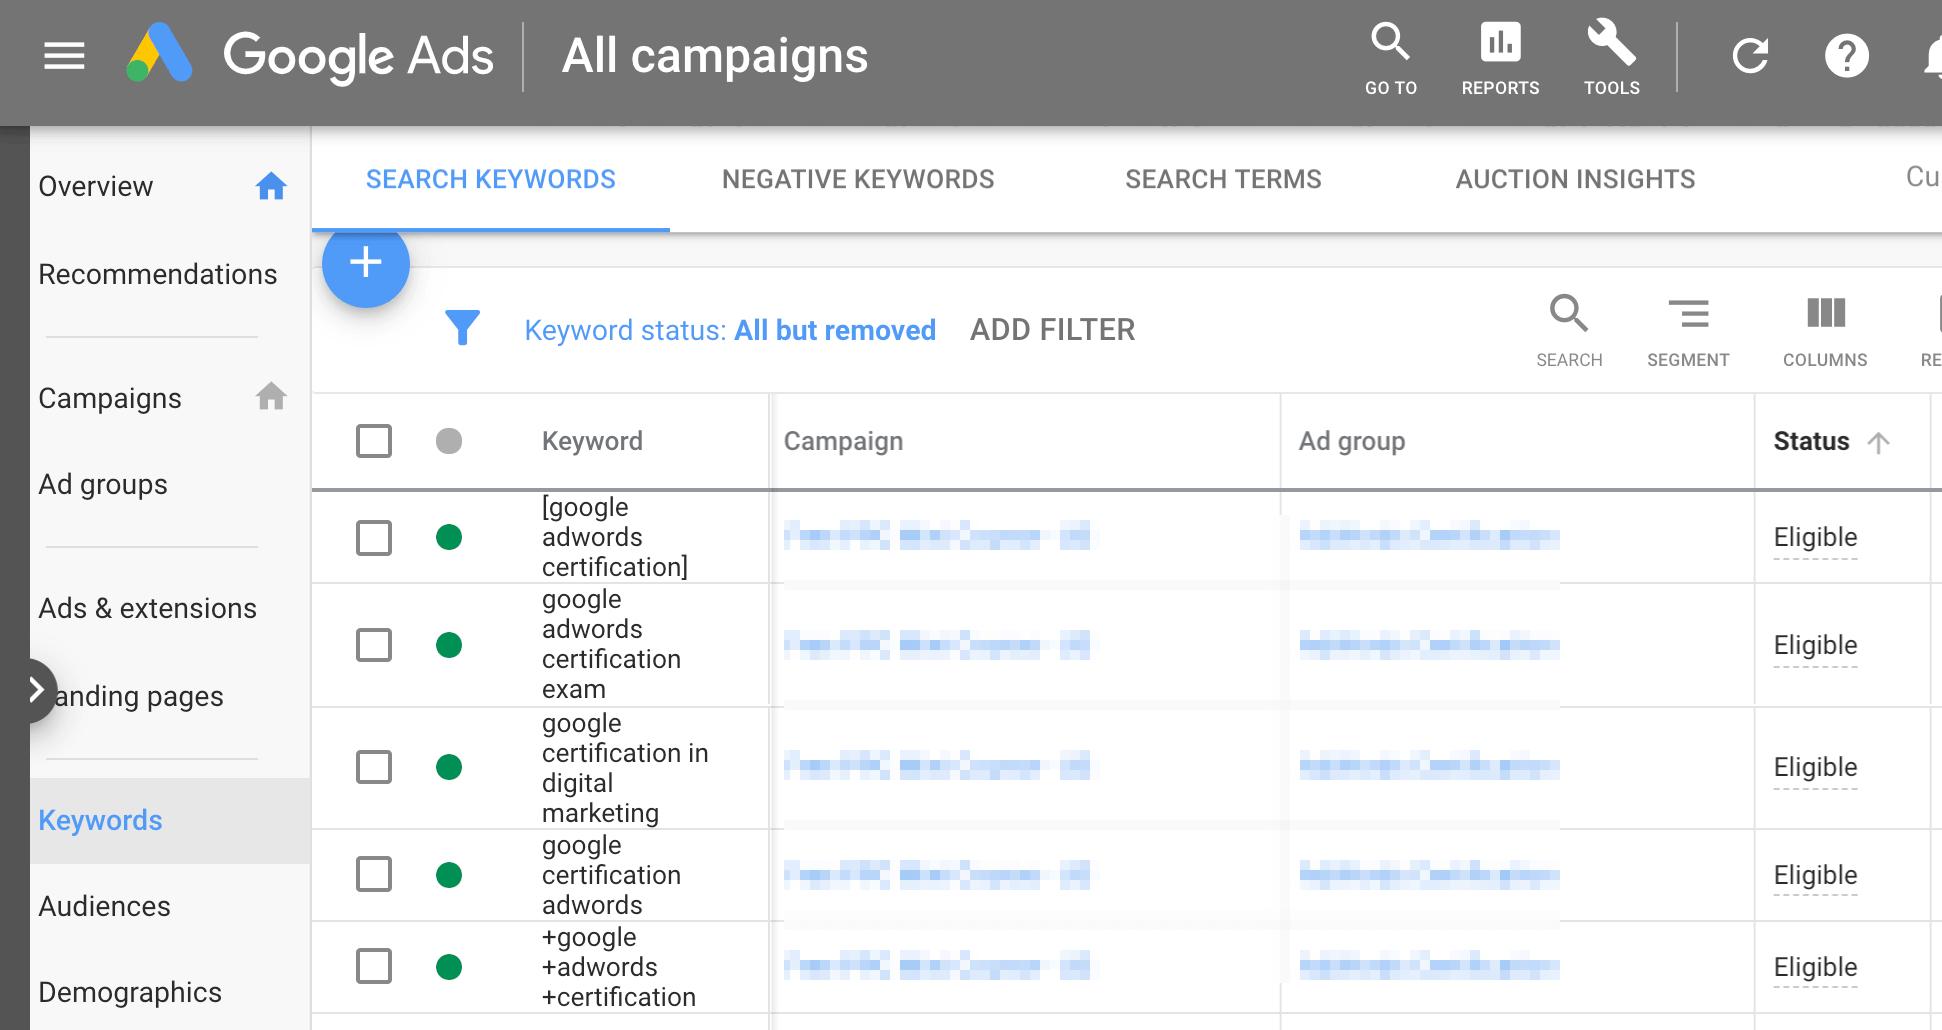 Keywords in Google Ads